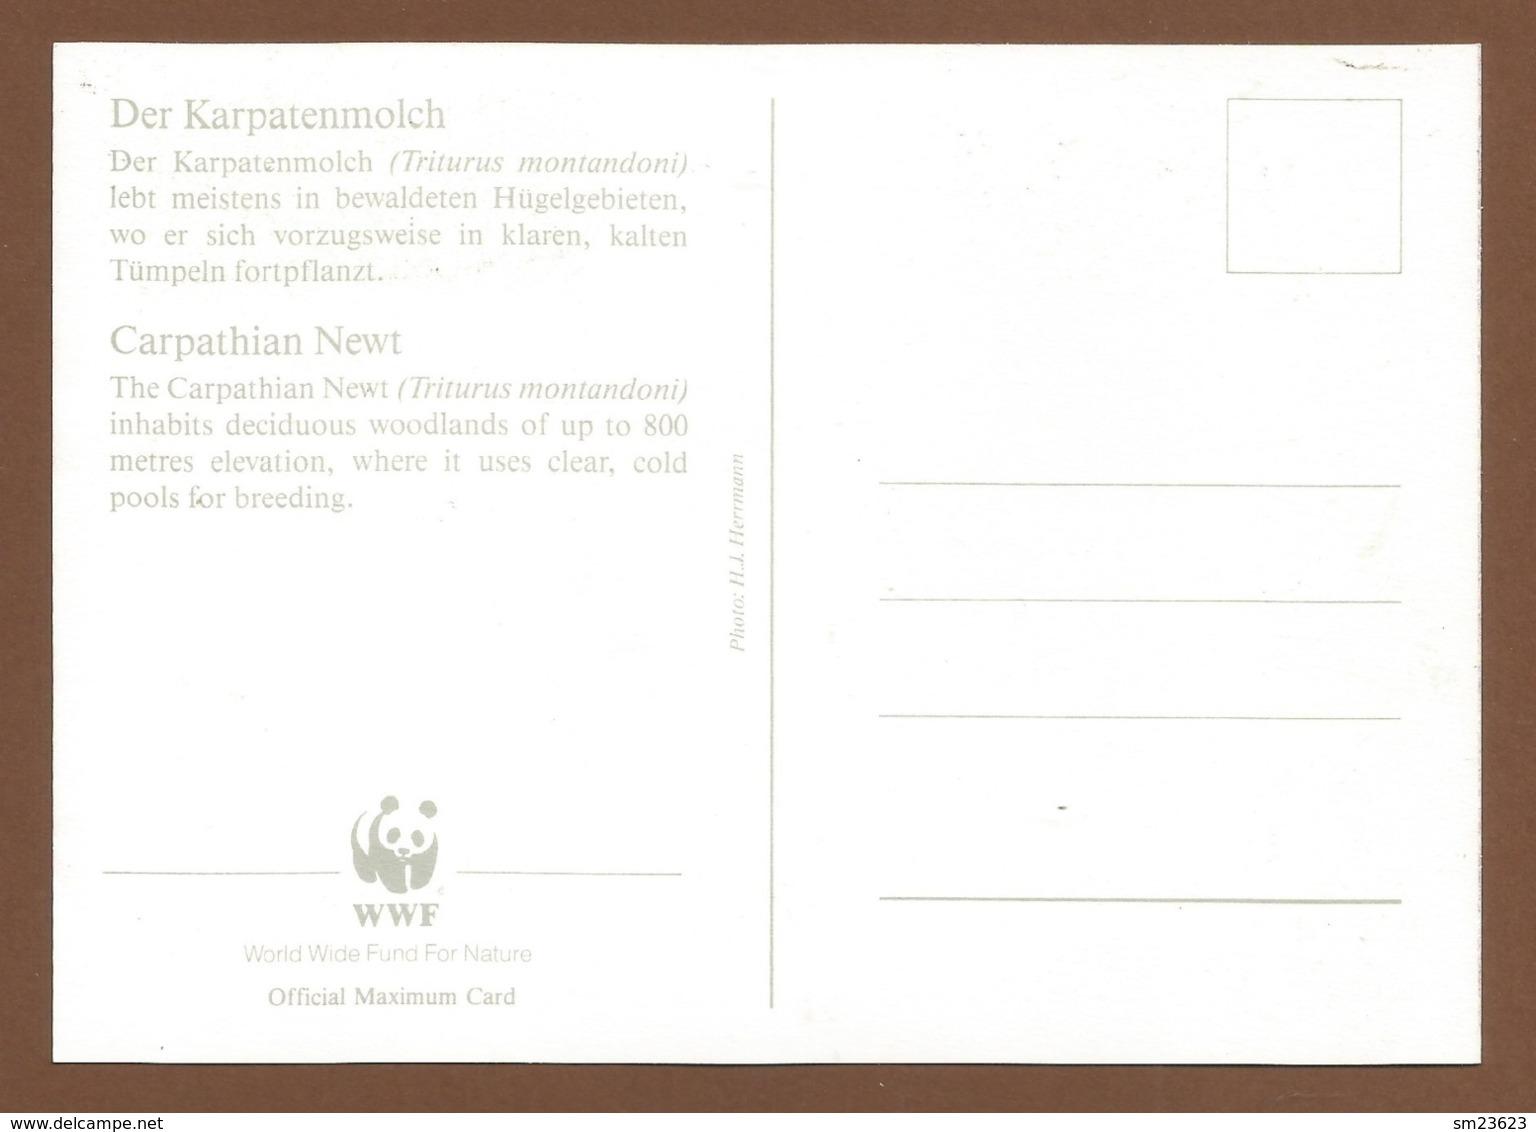 Ceskoslovensko  1989 , Carpathian Newt  ( Karpatenmolch) - WWF Official Maximum Card First Day  - PRAHA 18-7-1989 - Tschechoslowakei/CSSR